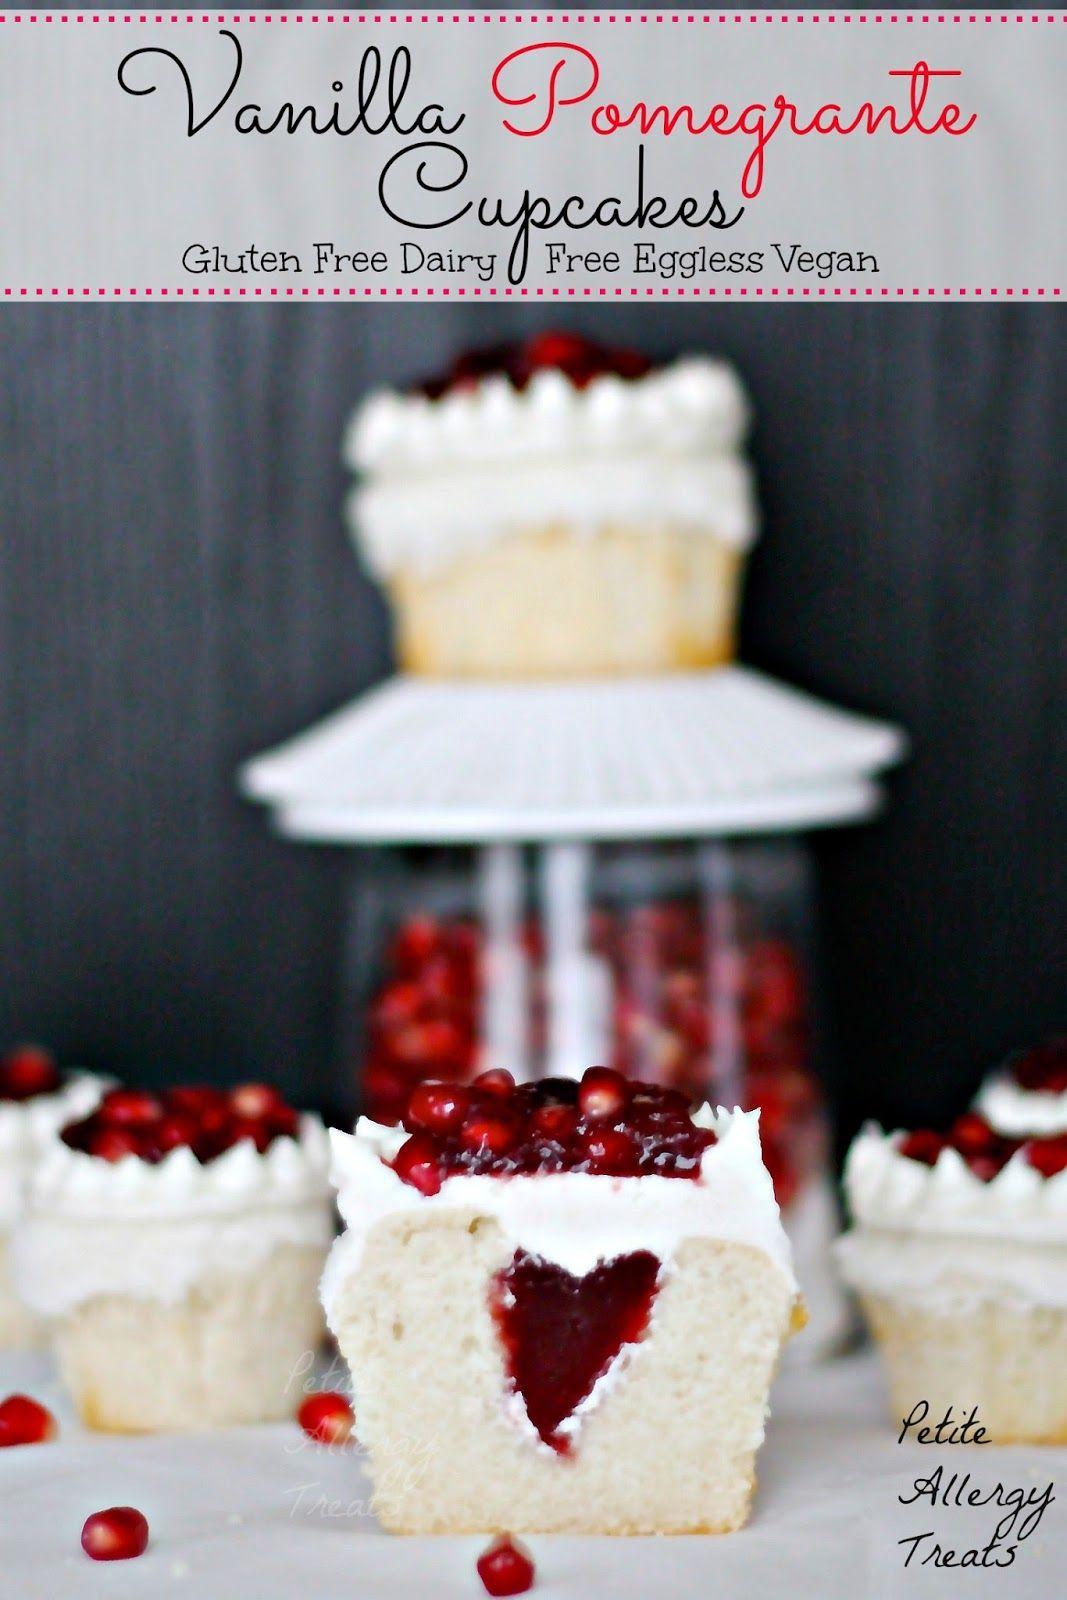 Gluten Free Vegan Vanilla Pomegranate Cupcakes Gluten Free Cupcakes Gluten Free Sweets Desserts